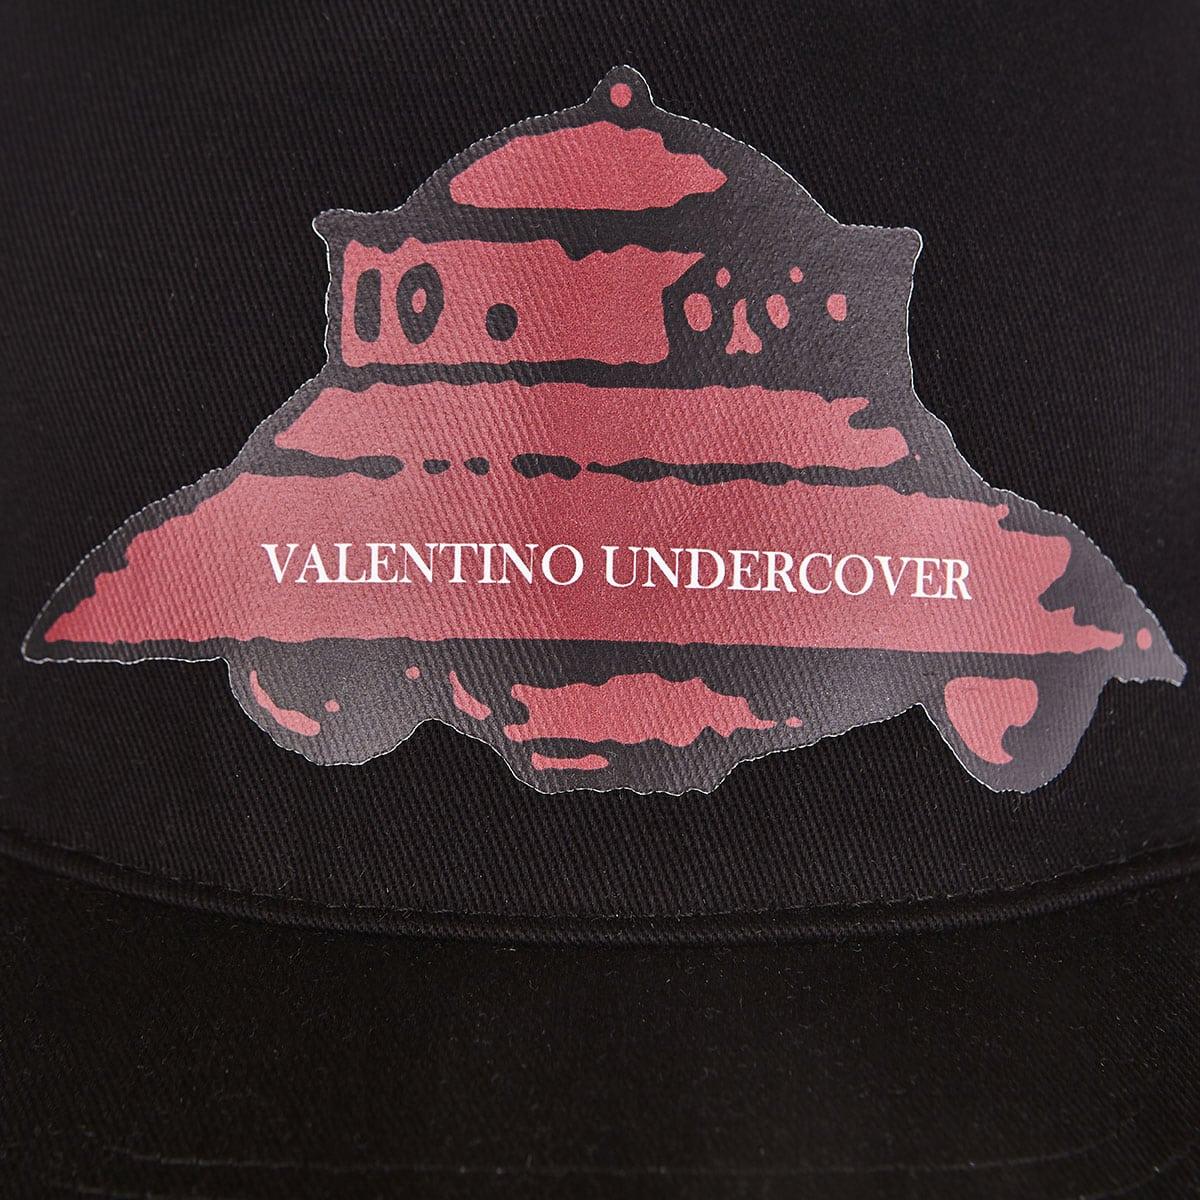 x Undercover printed baseball cap